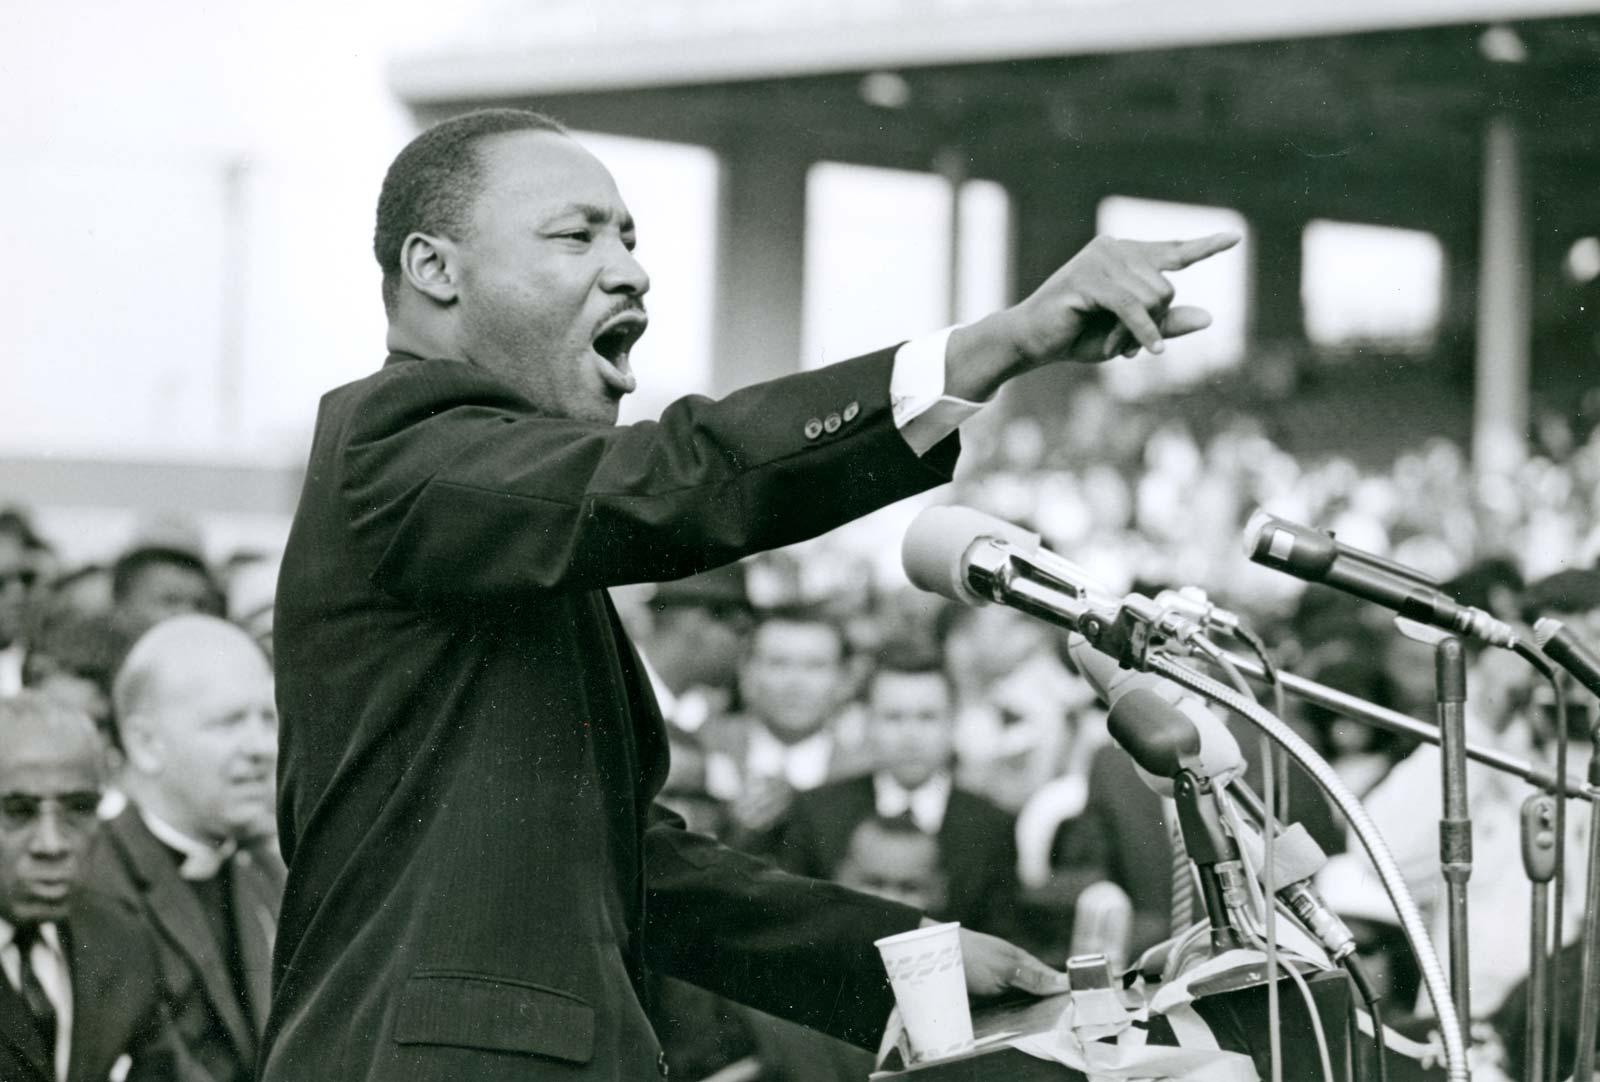 Honoring MLK Day: Dr. Martin Luther King Jr.